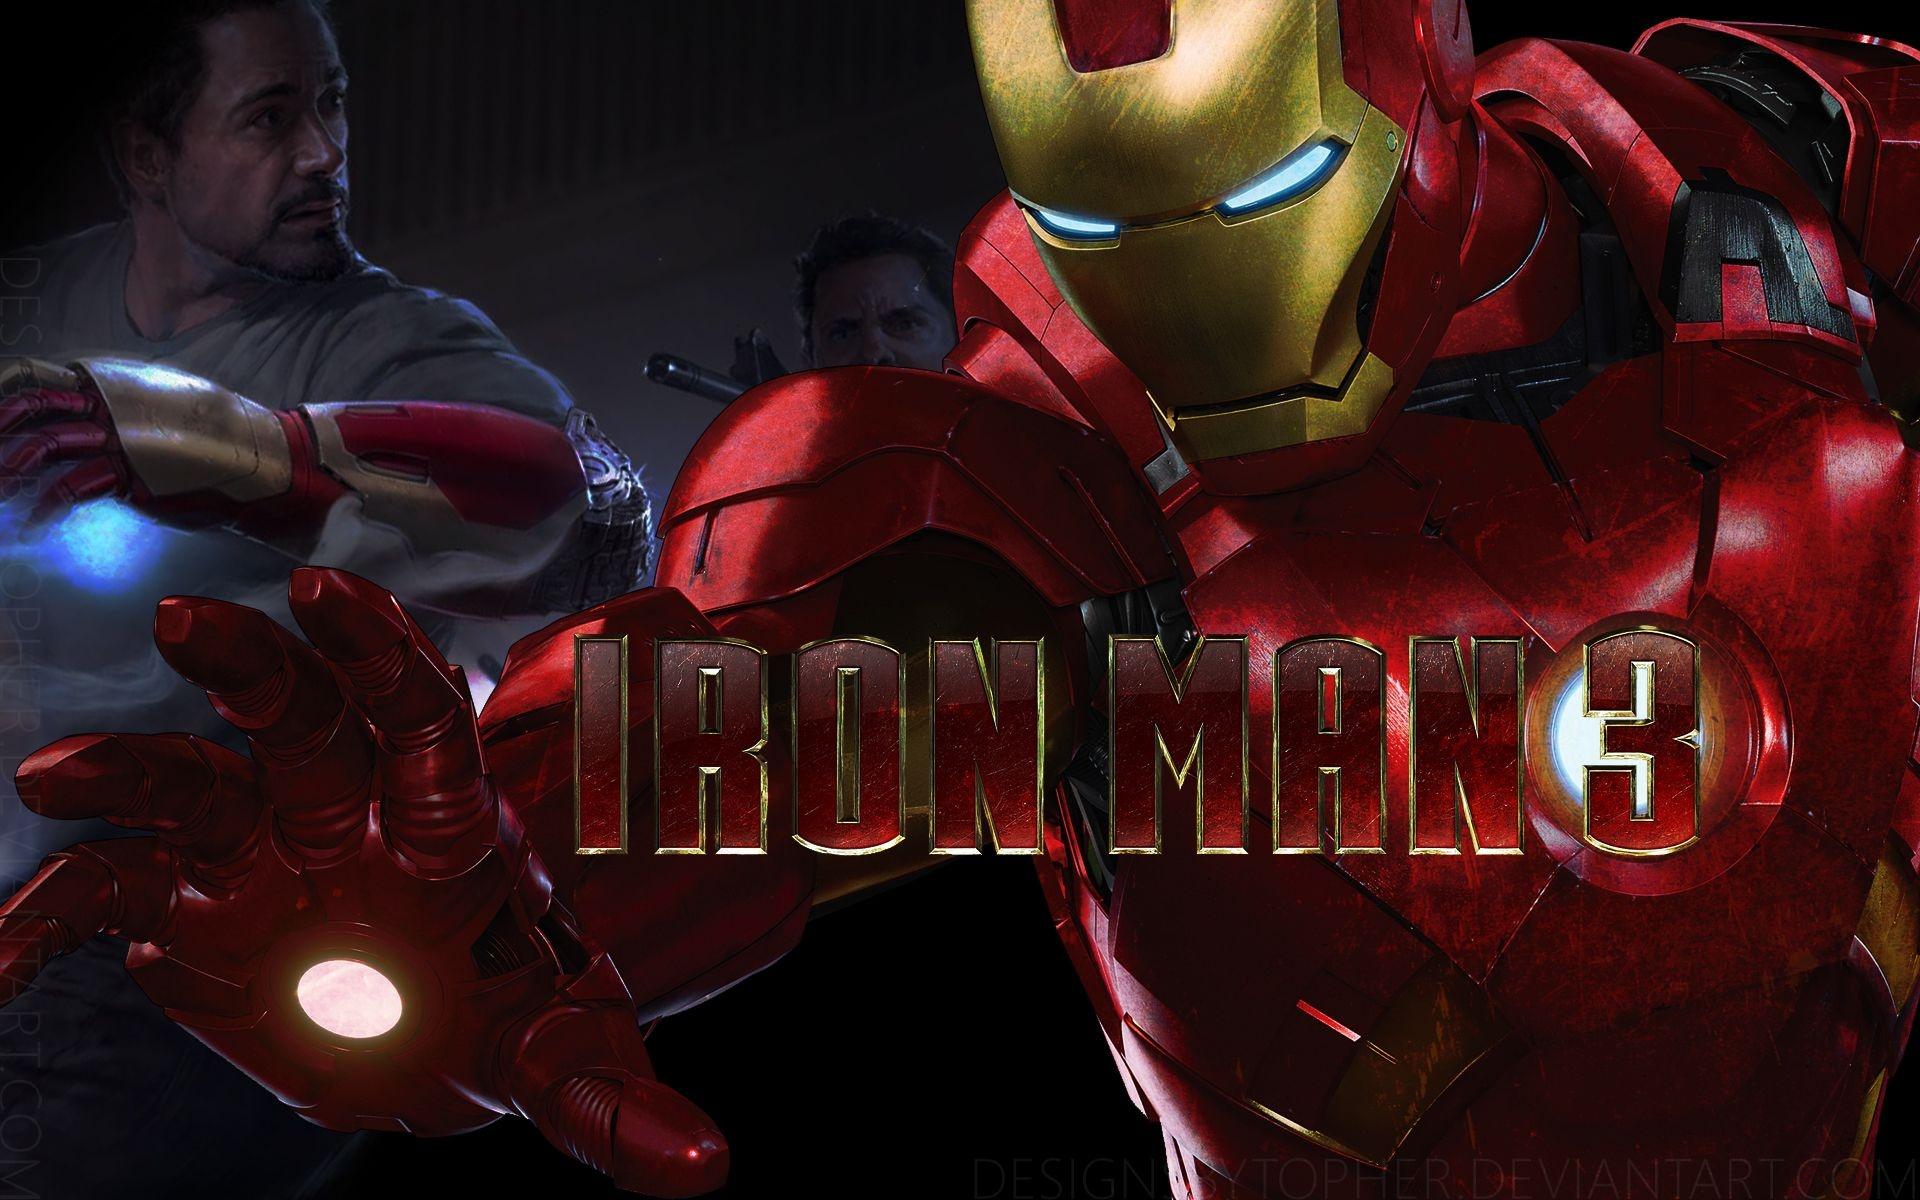 Iron Man Wallpaper 34447: 배경 화면 2013 영화 아이언 맨 3 1920x1200 HD 그림, 이미지